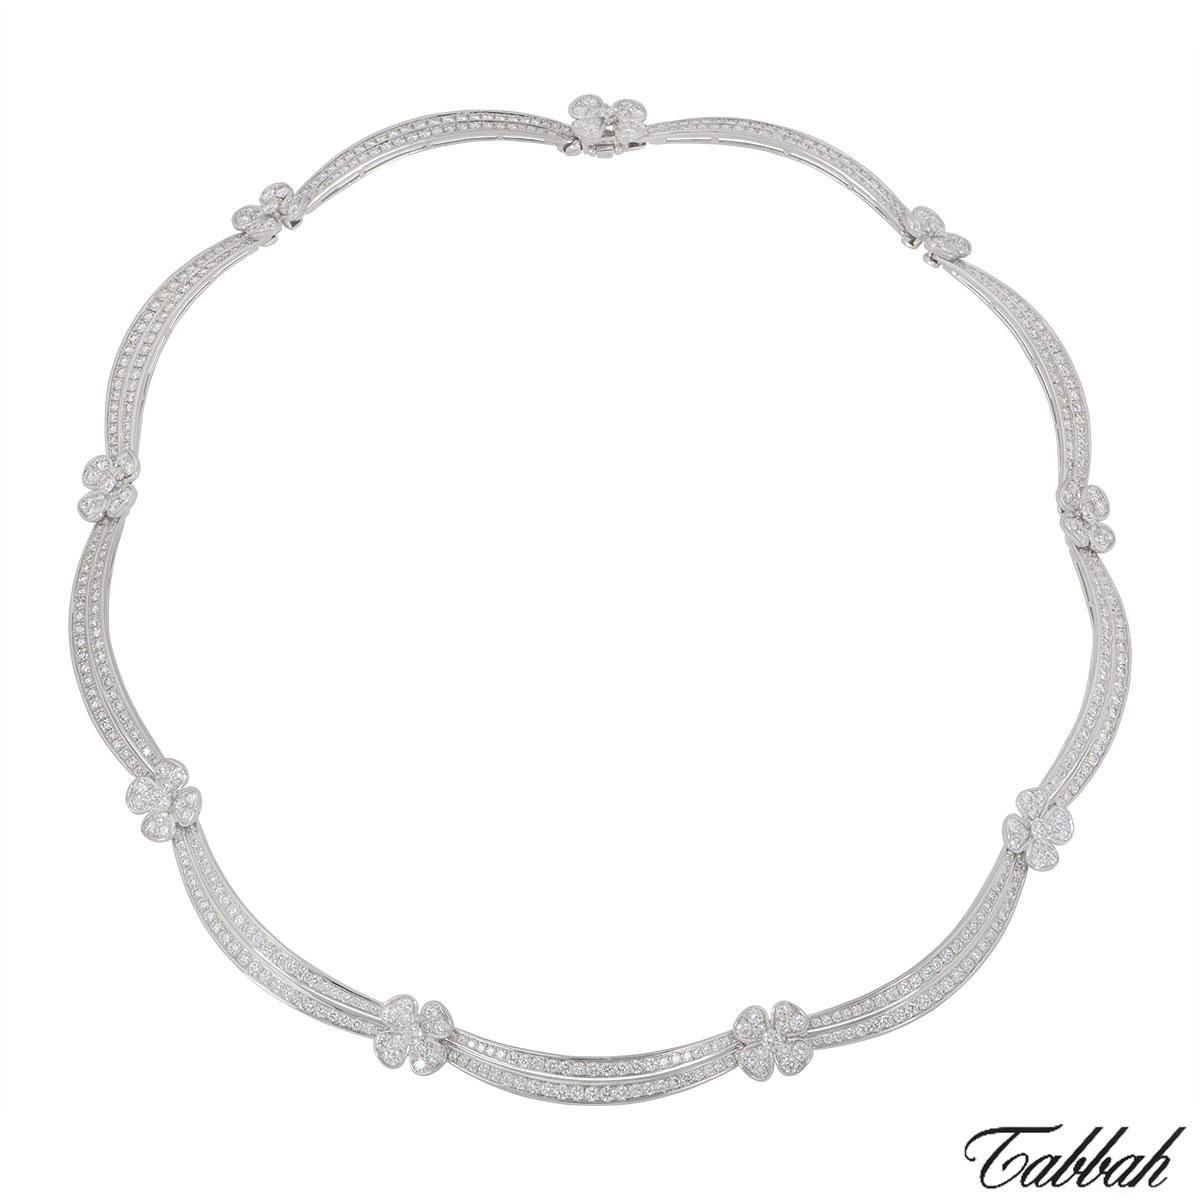 Tabbah White Gold Diamond Jewellery Suite